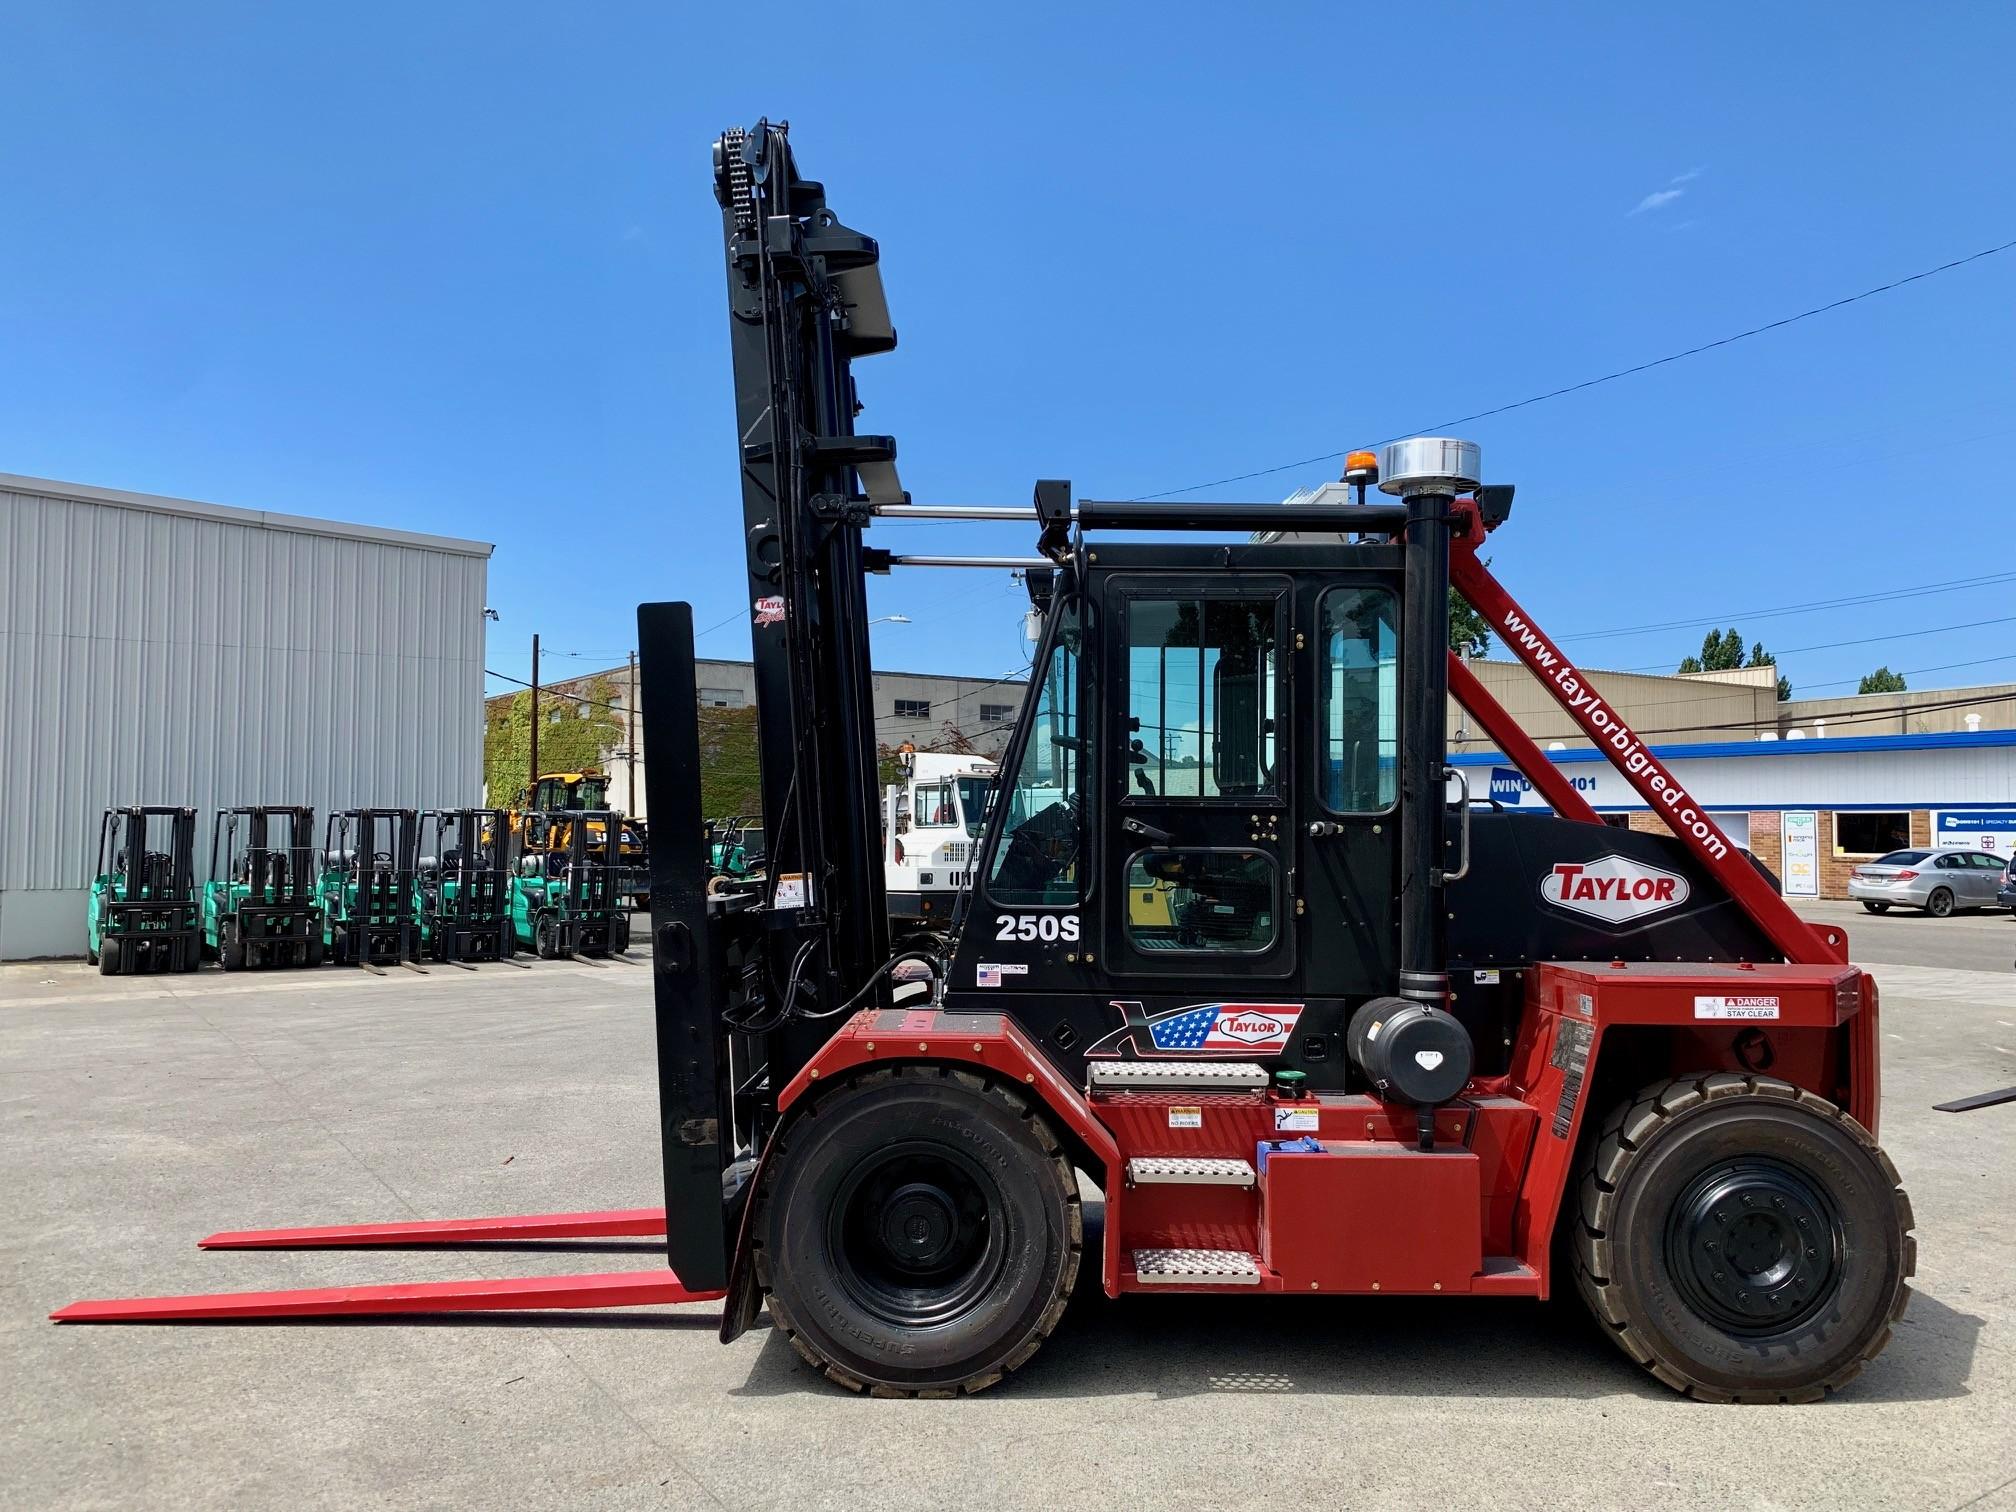 Washington Liftruck,a full line forklift and intermodal equipment